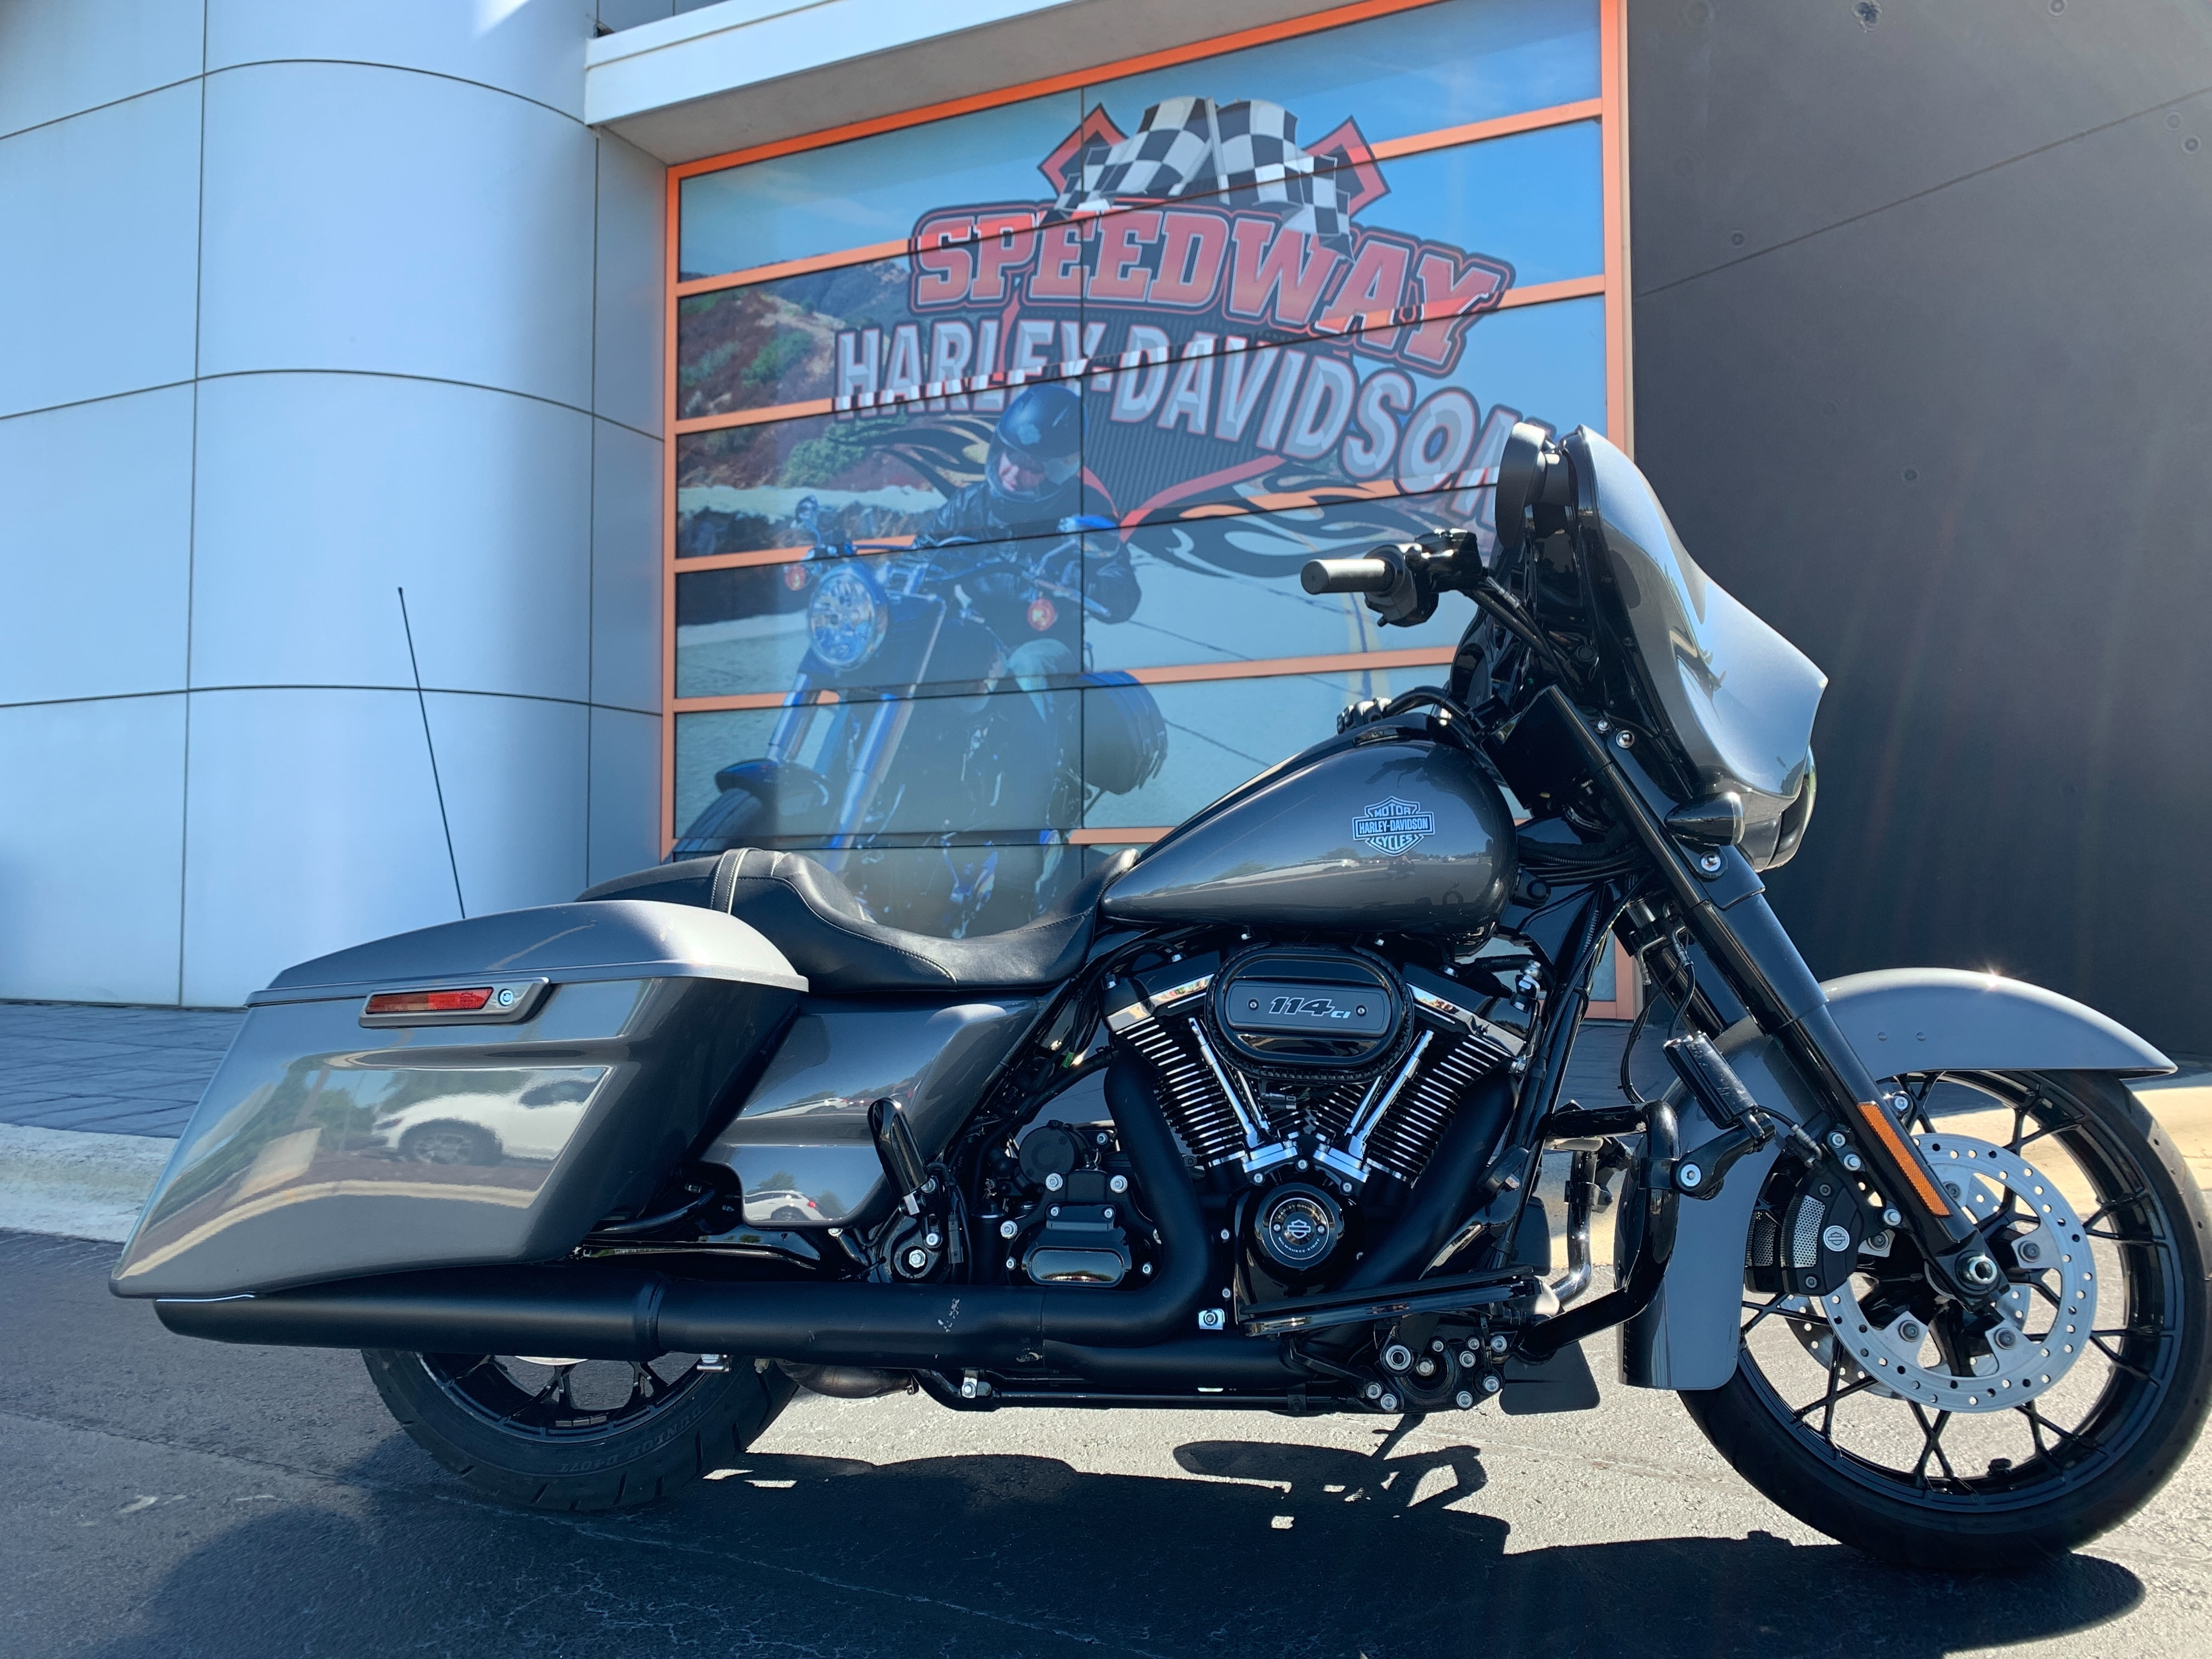 2021 Harley-Davidson Grand American Touring Street Glide Special at Speedway Harley-Davidson